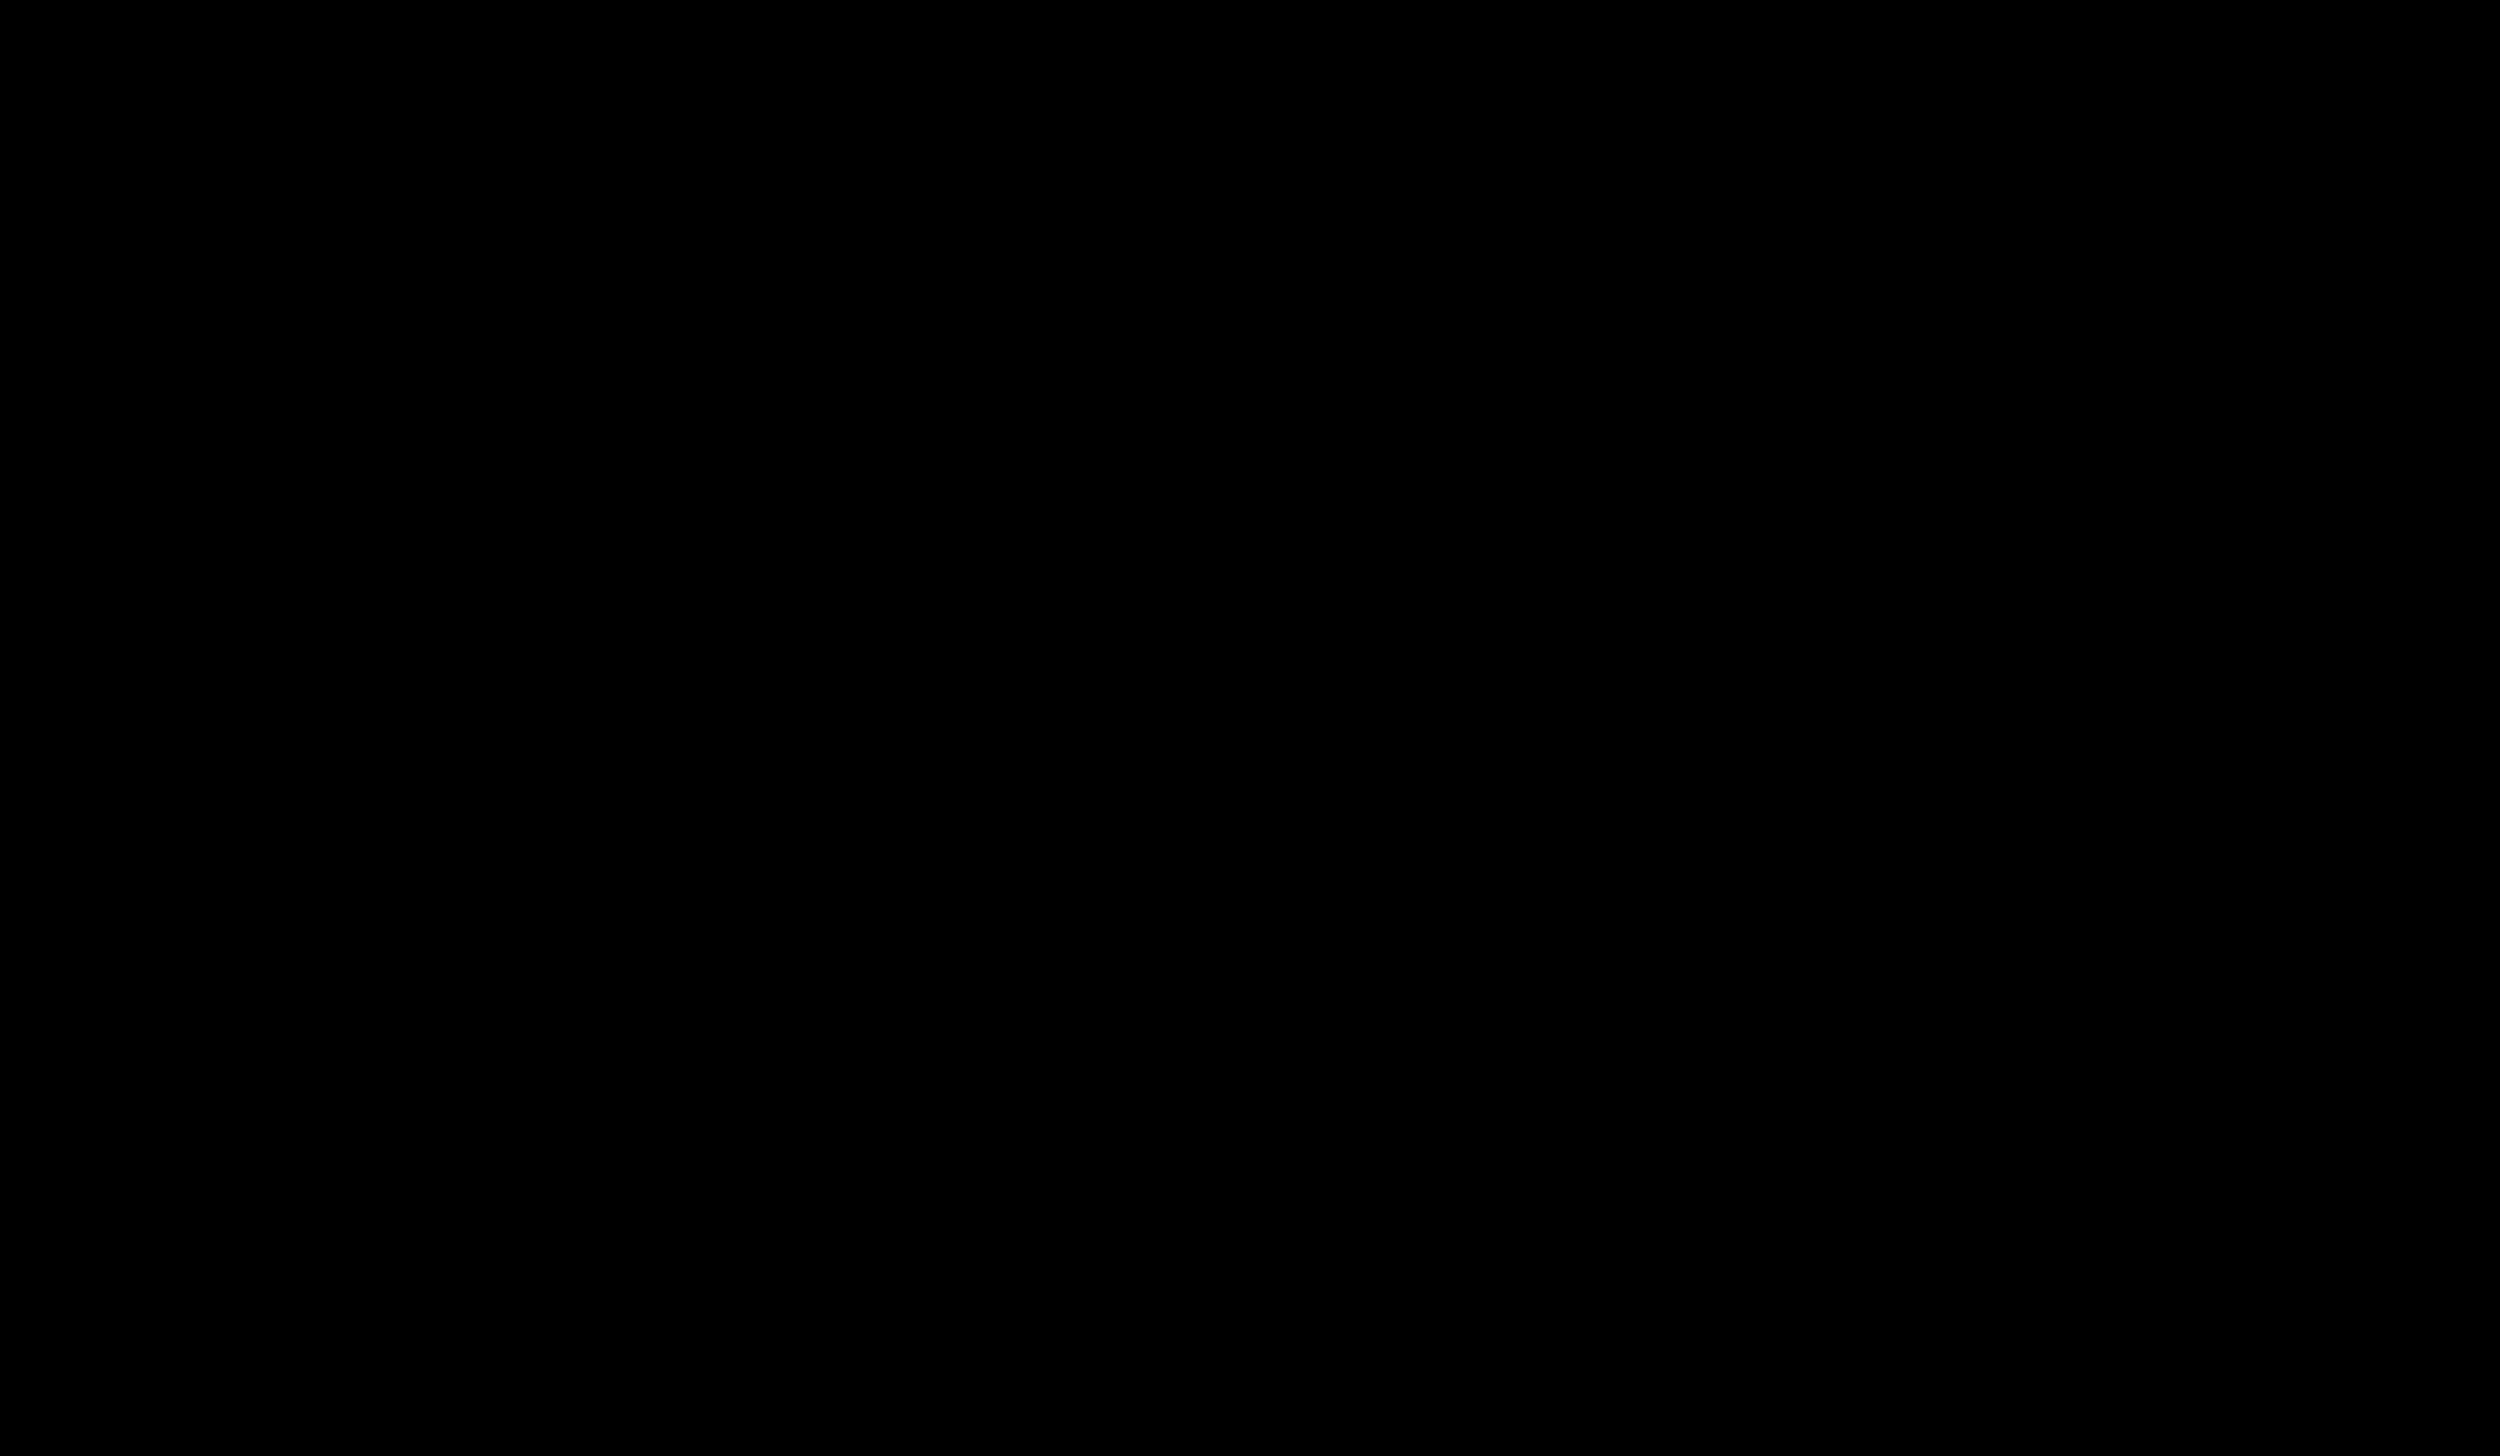 Untitled1-copy_0021_logo_.pdf.png